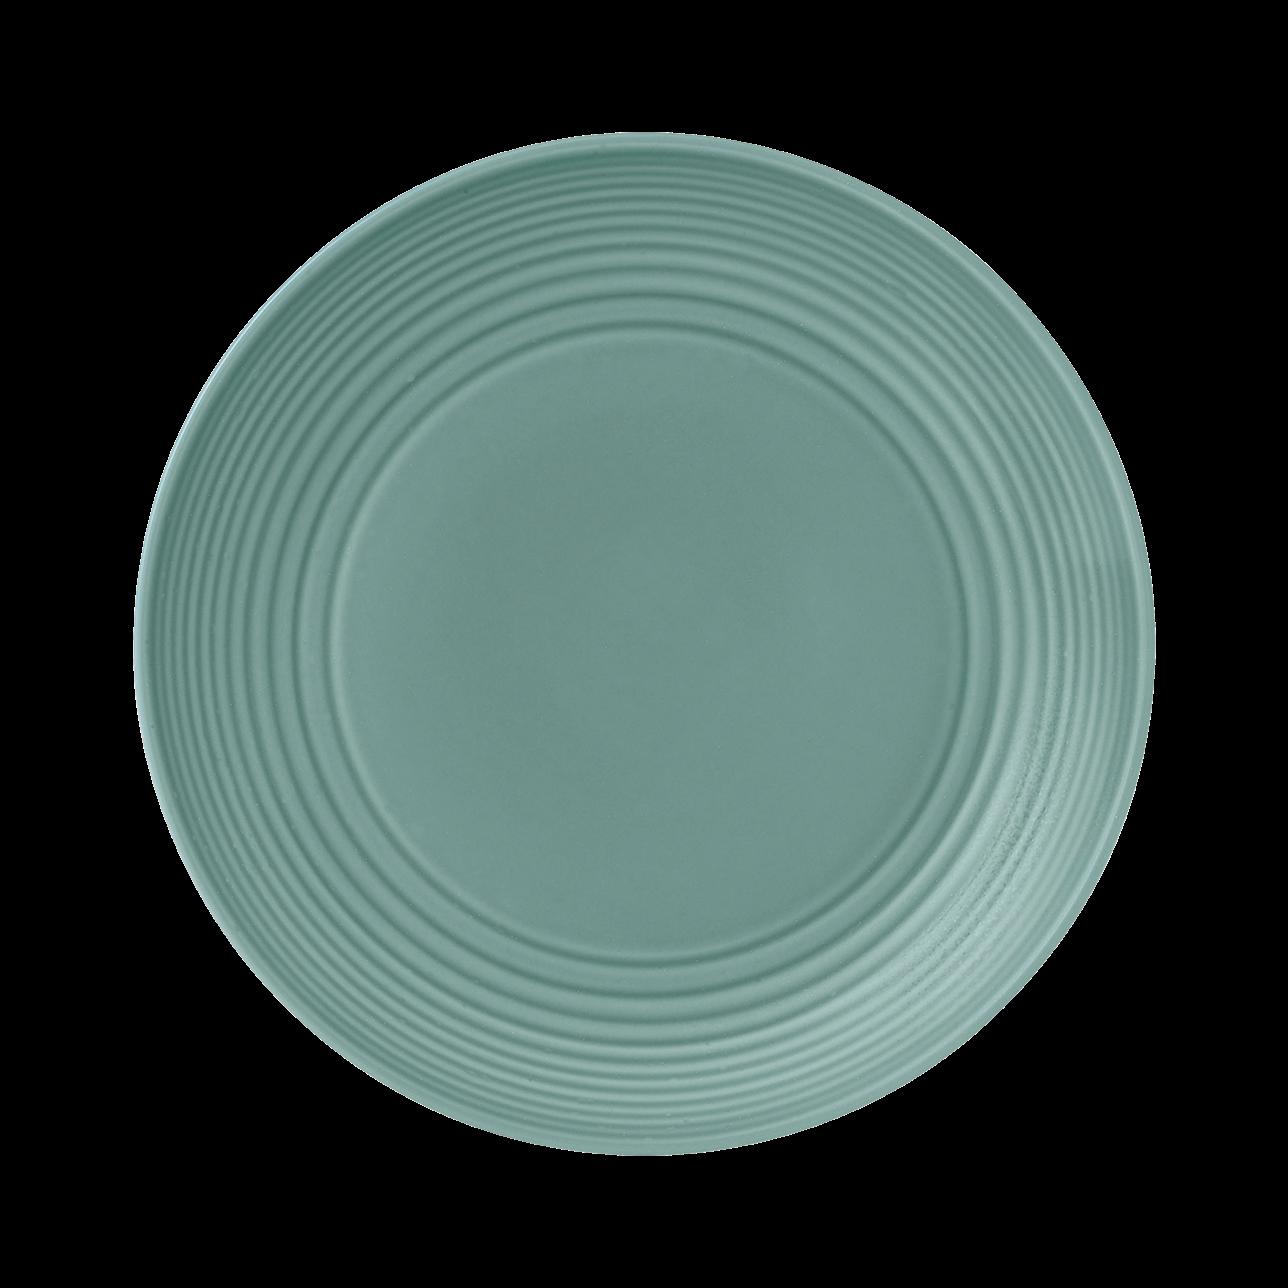 Maze Teal Side Plate